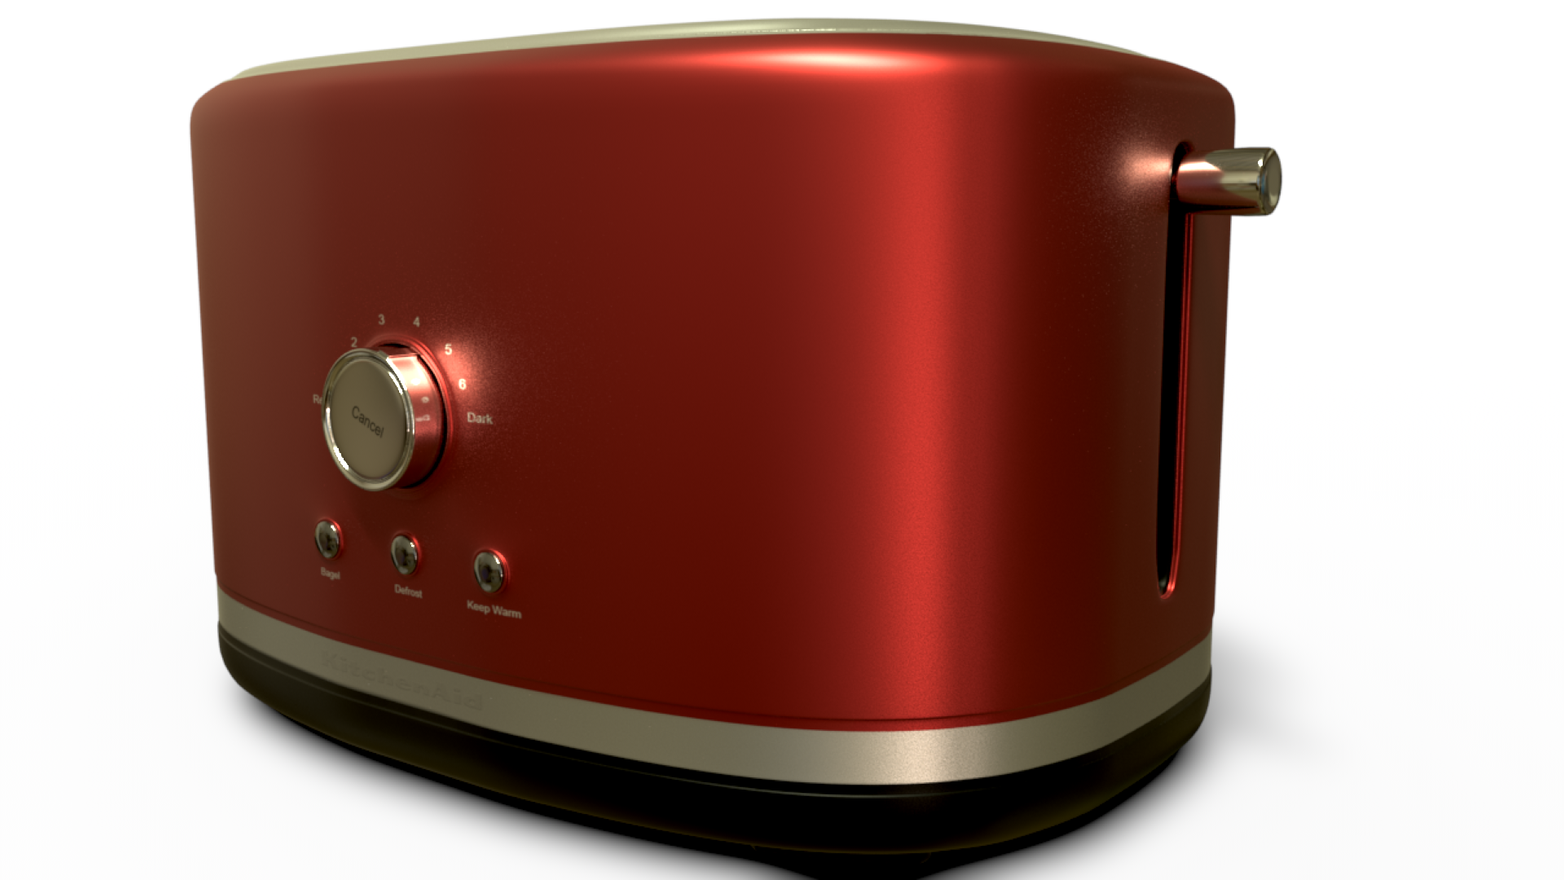 Toaster Render 1